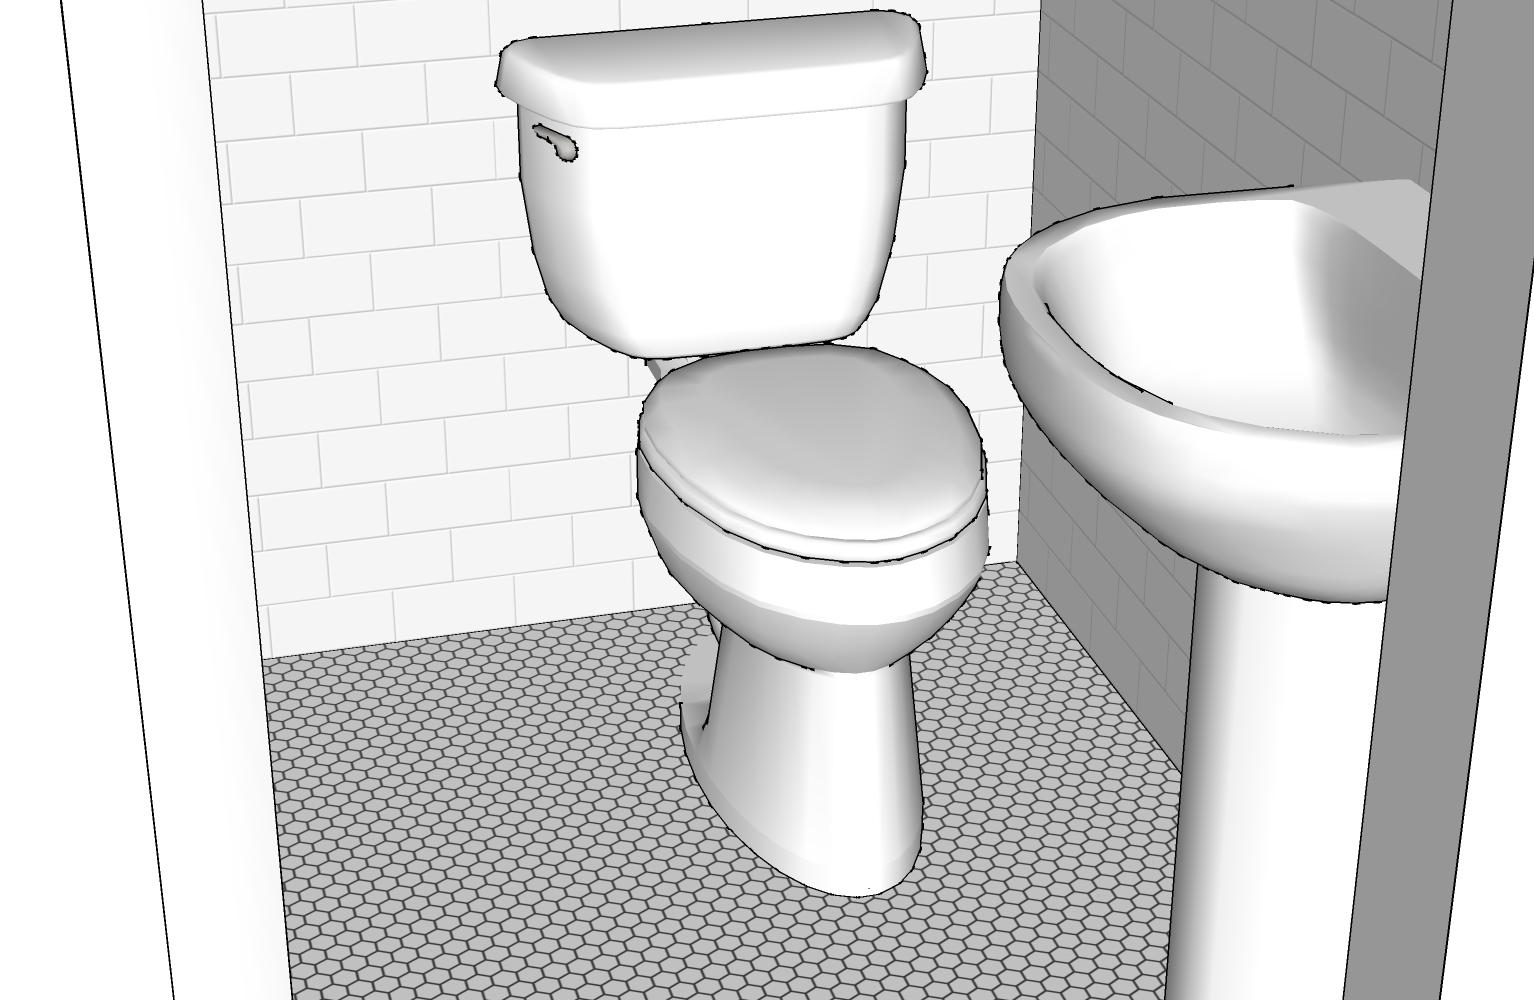 Occupy wolf street sketchup bathroom for Sketchup bathroom sink